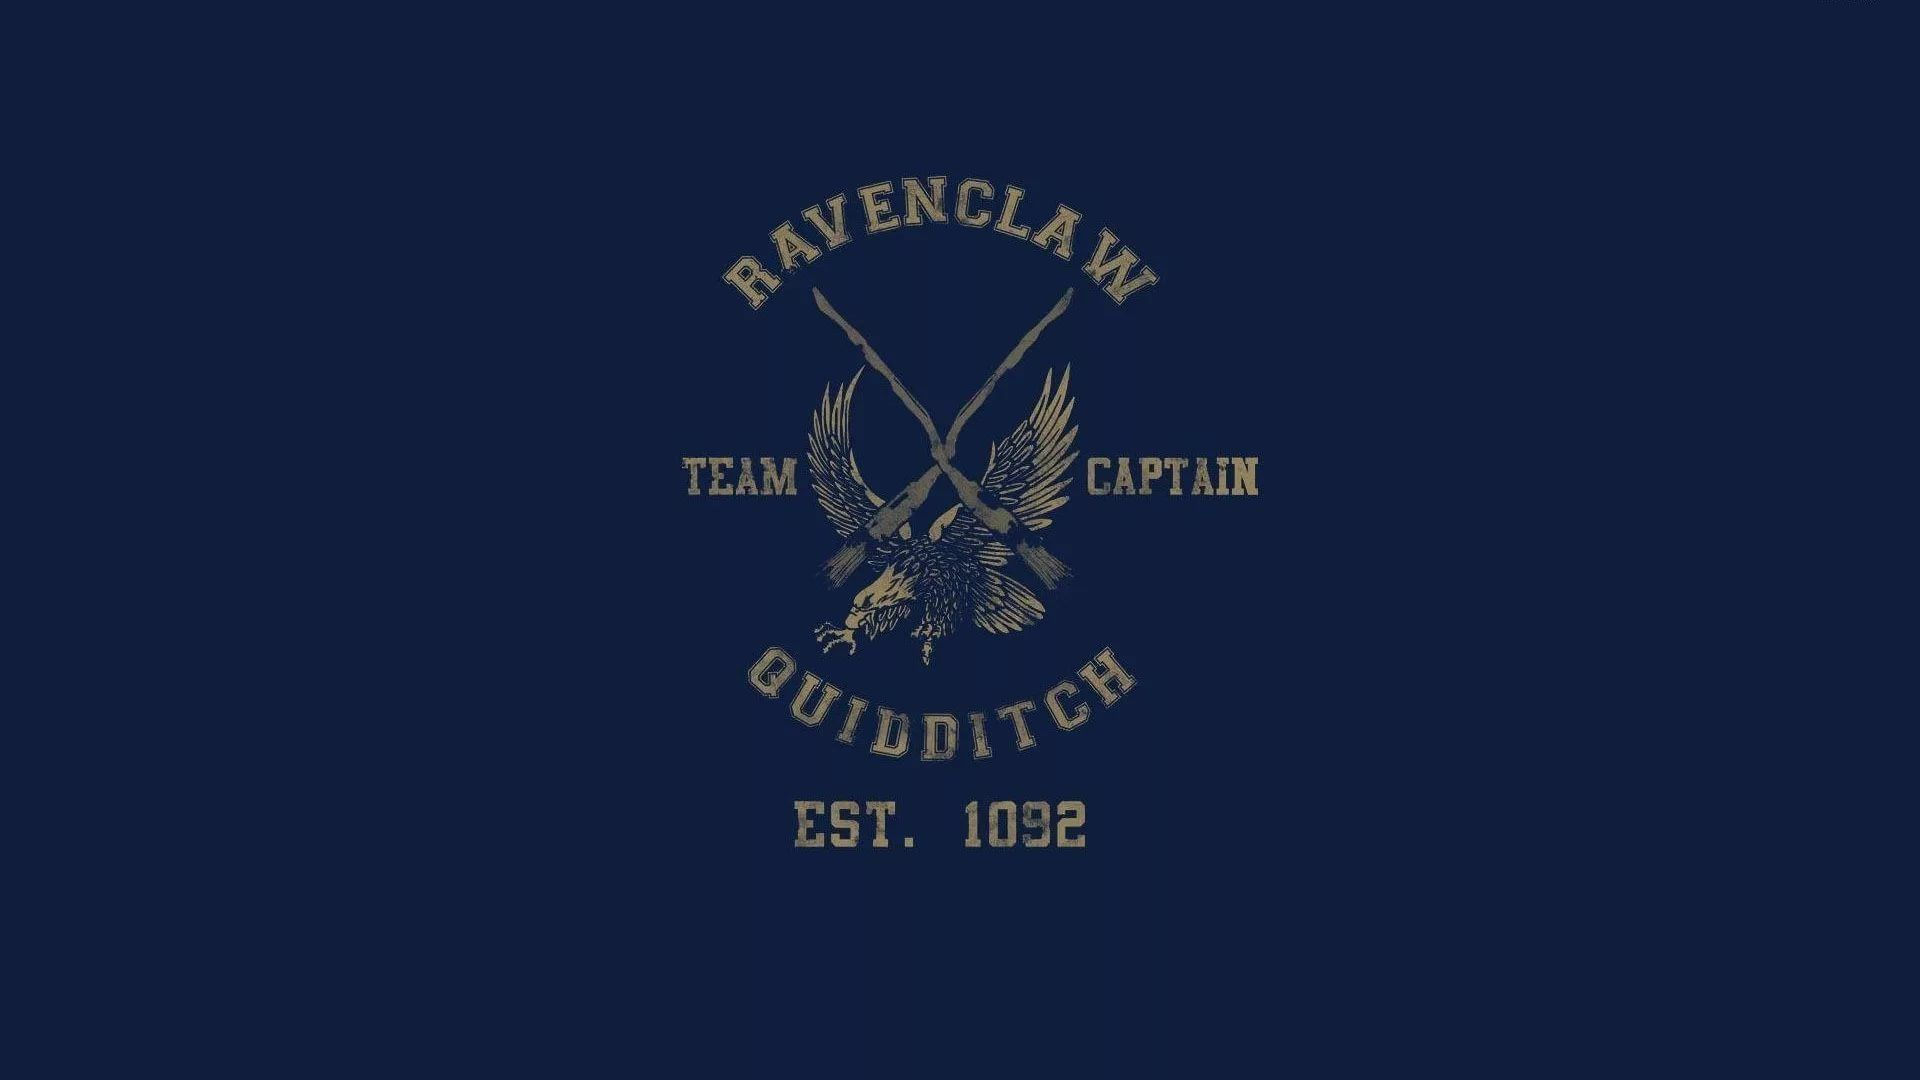 Ravenclaw Wallpaper Image